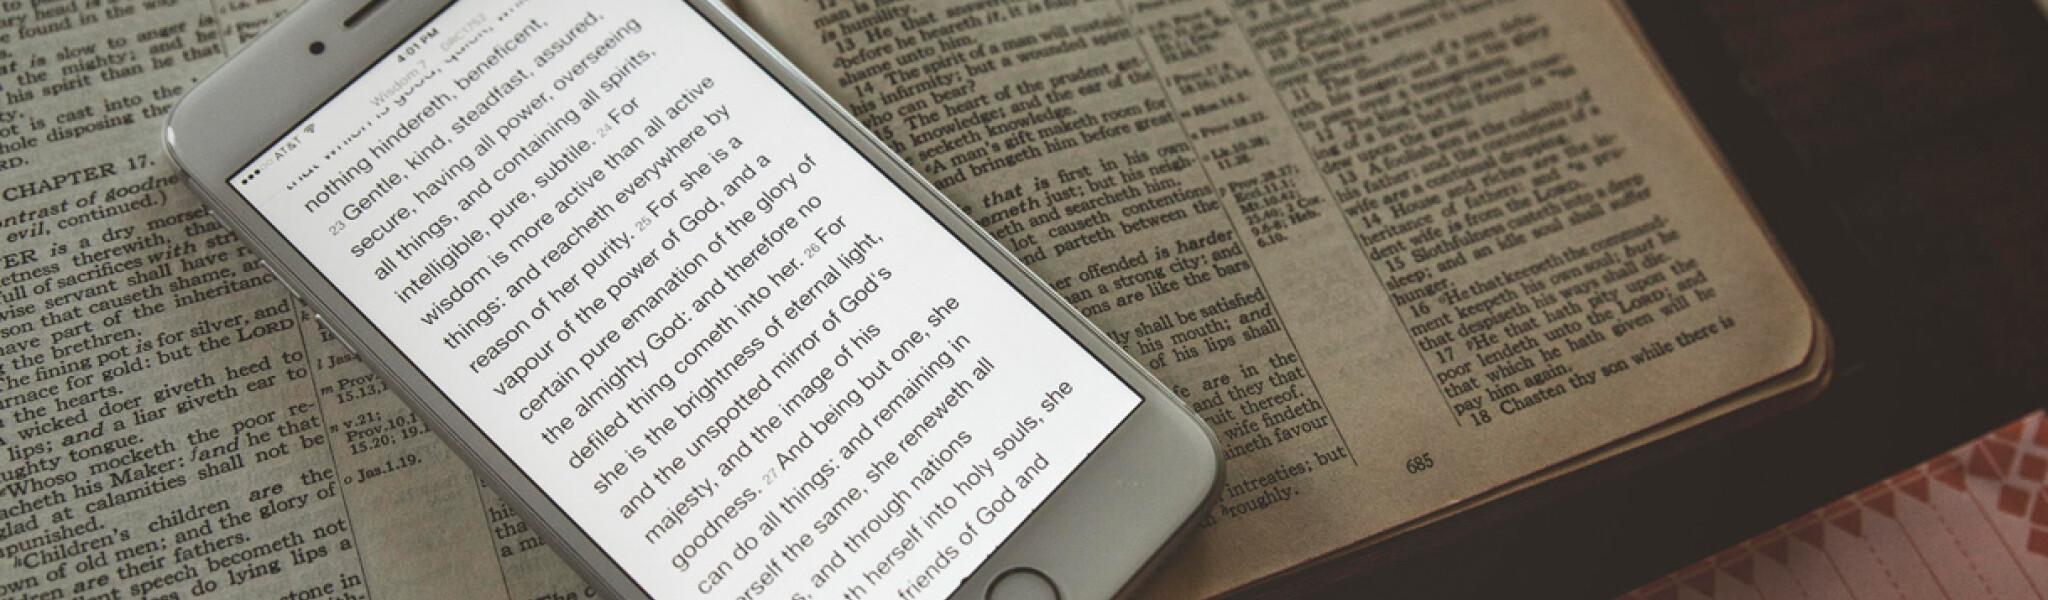 Bible Study and Sunday School | Cornerstone Lutheran Church | Cornerstone Lutheran Church